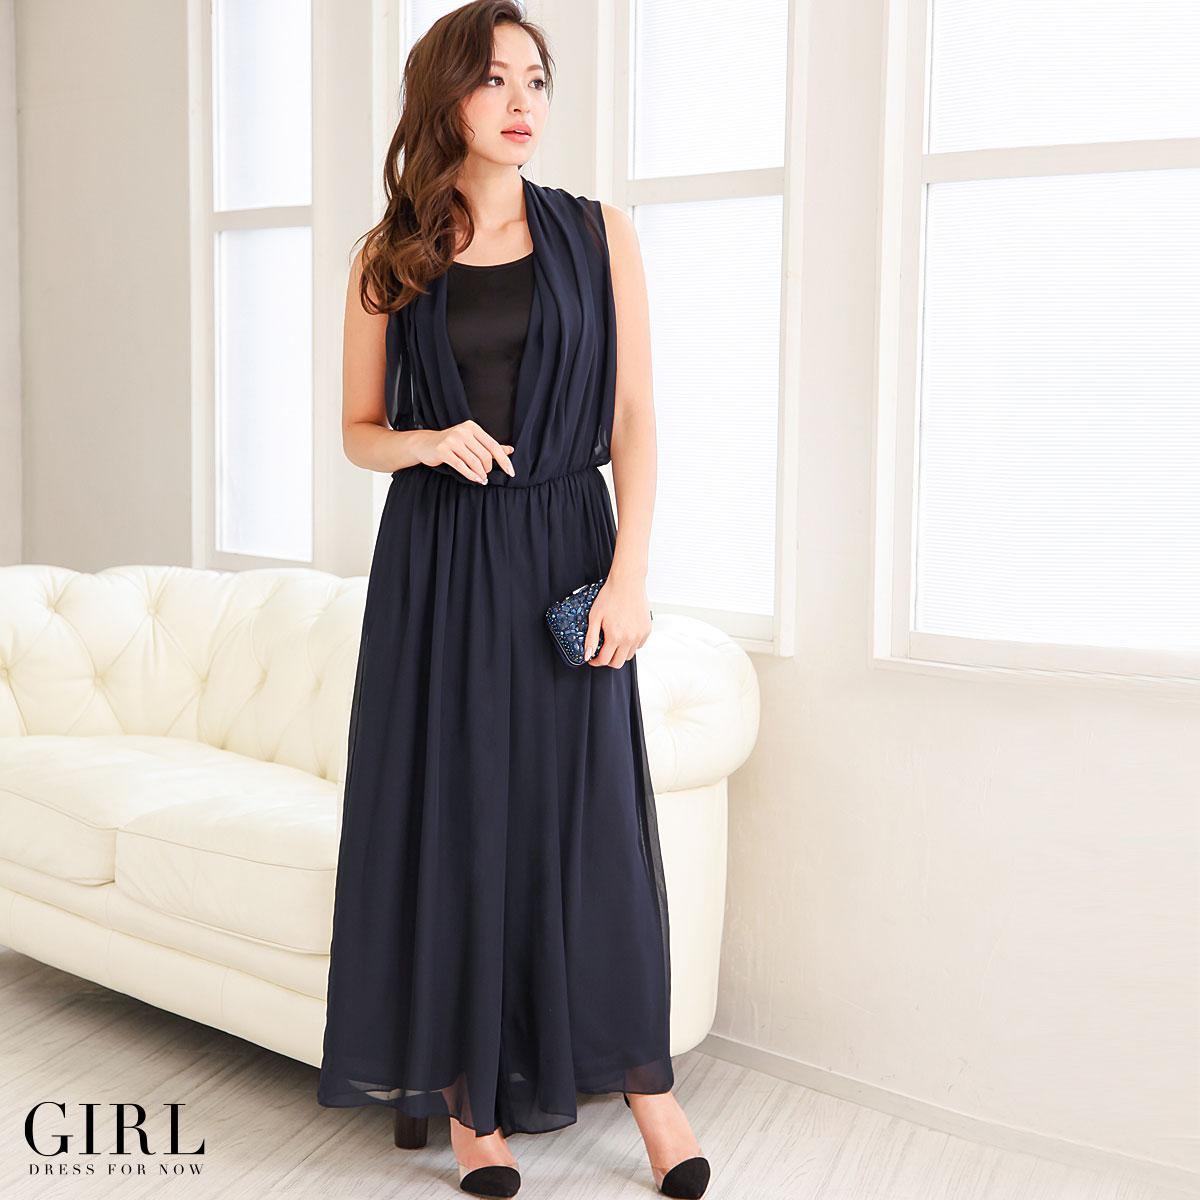 Dress Shop GIRL: Party Dress Pantdress Wedding Ceremony